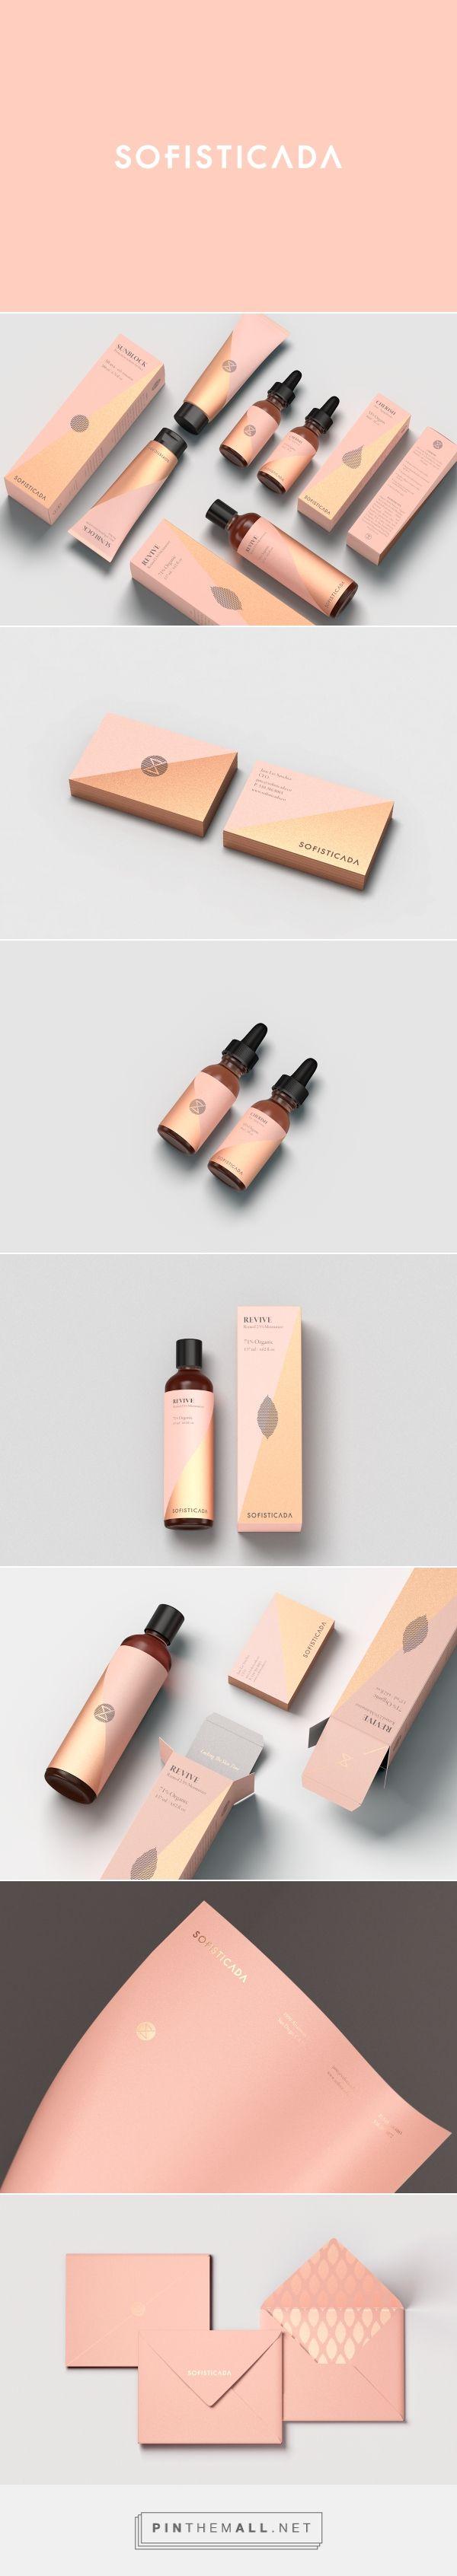 Sofisticada Skincare Packaging design by RCVS (Colombia) - http://www.packagingoftheworld.com/2016/07/sofisticada.html